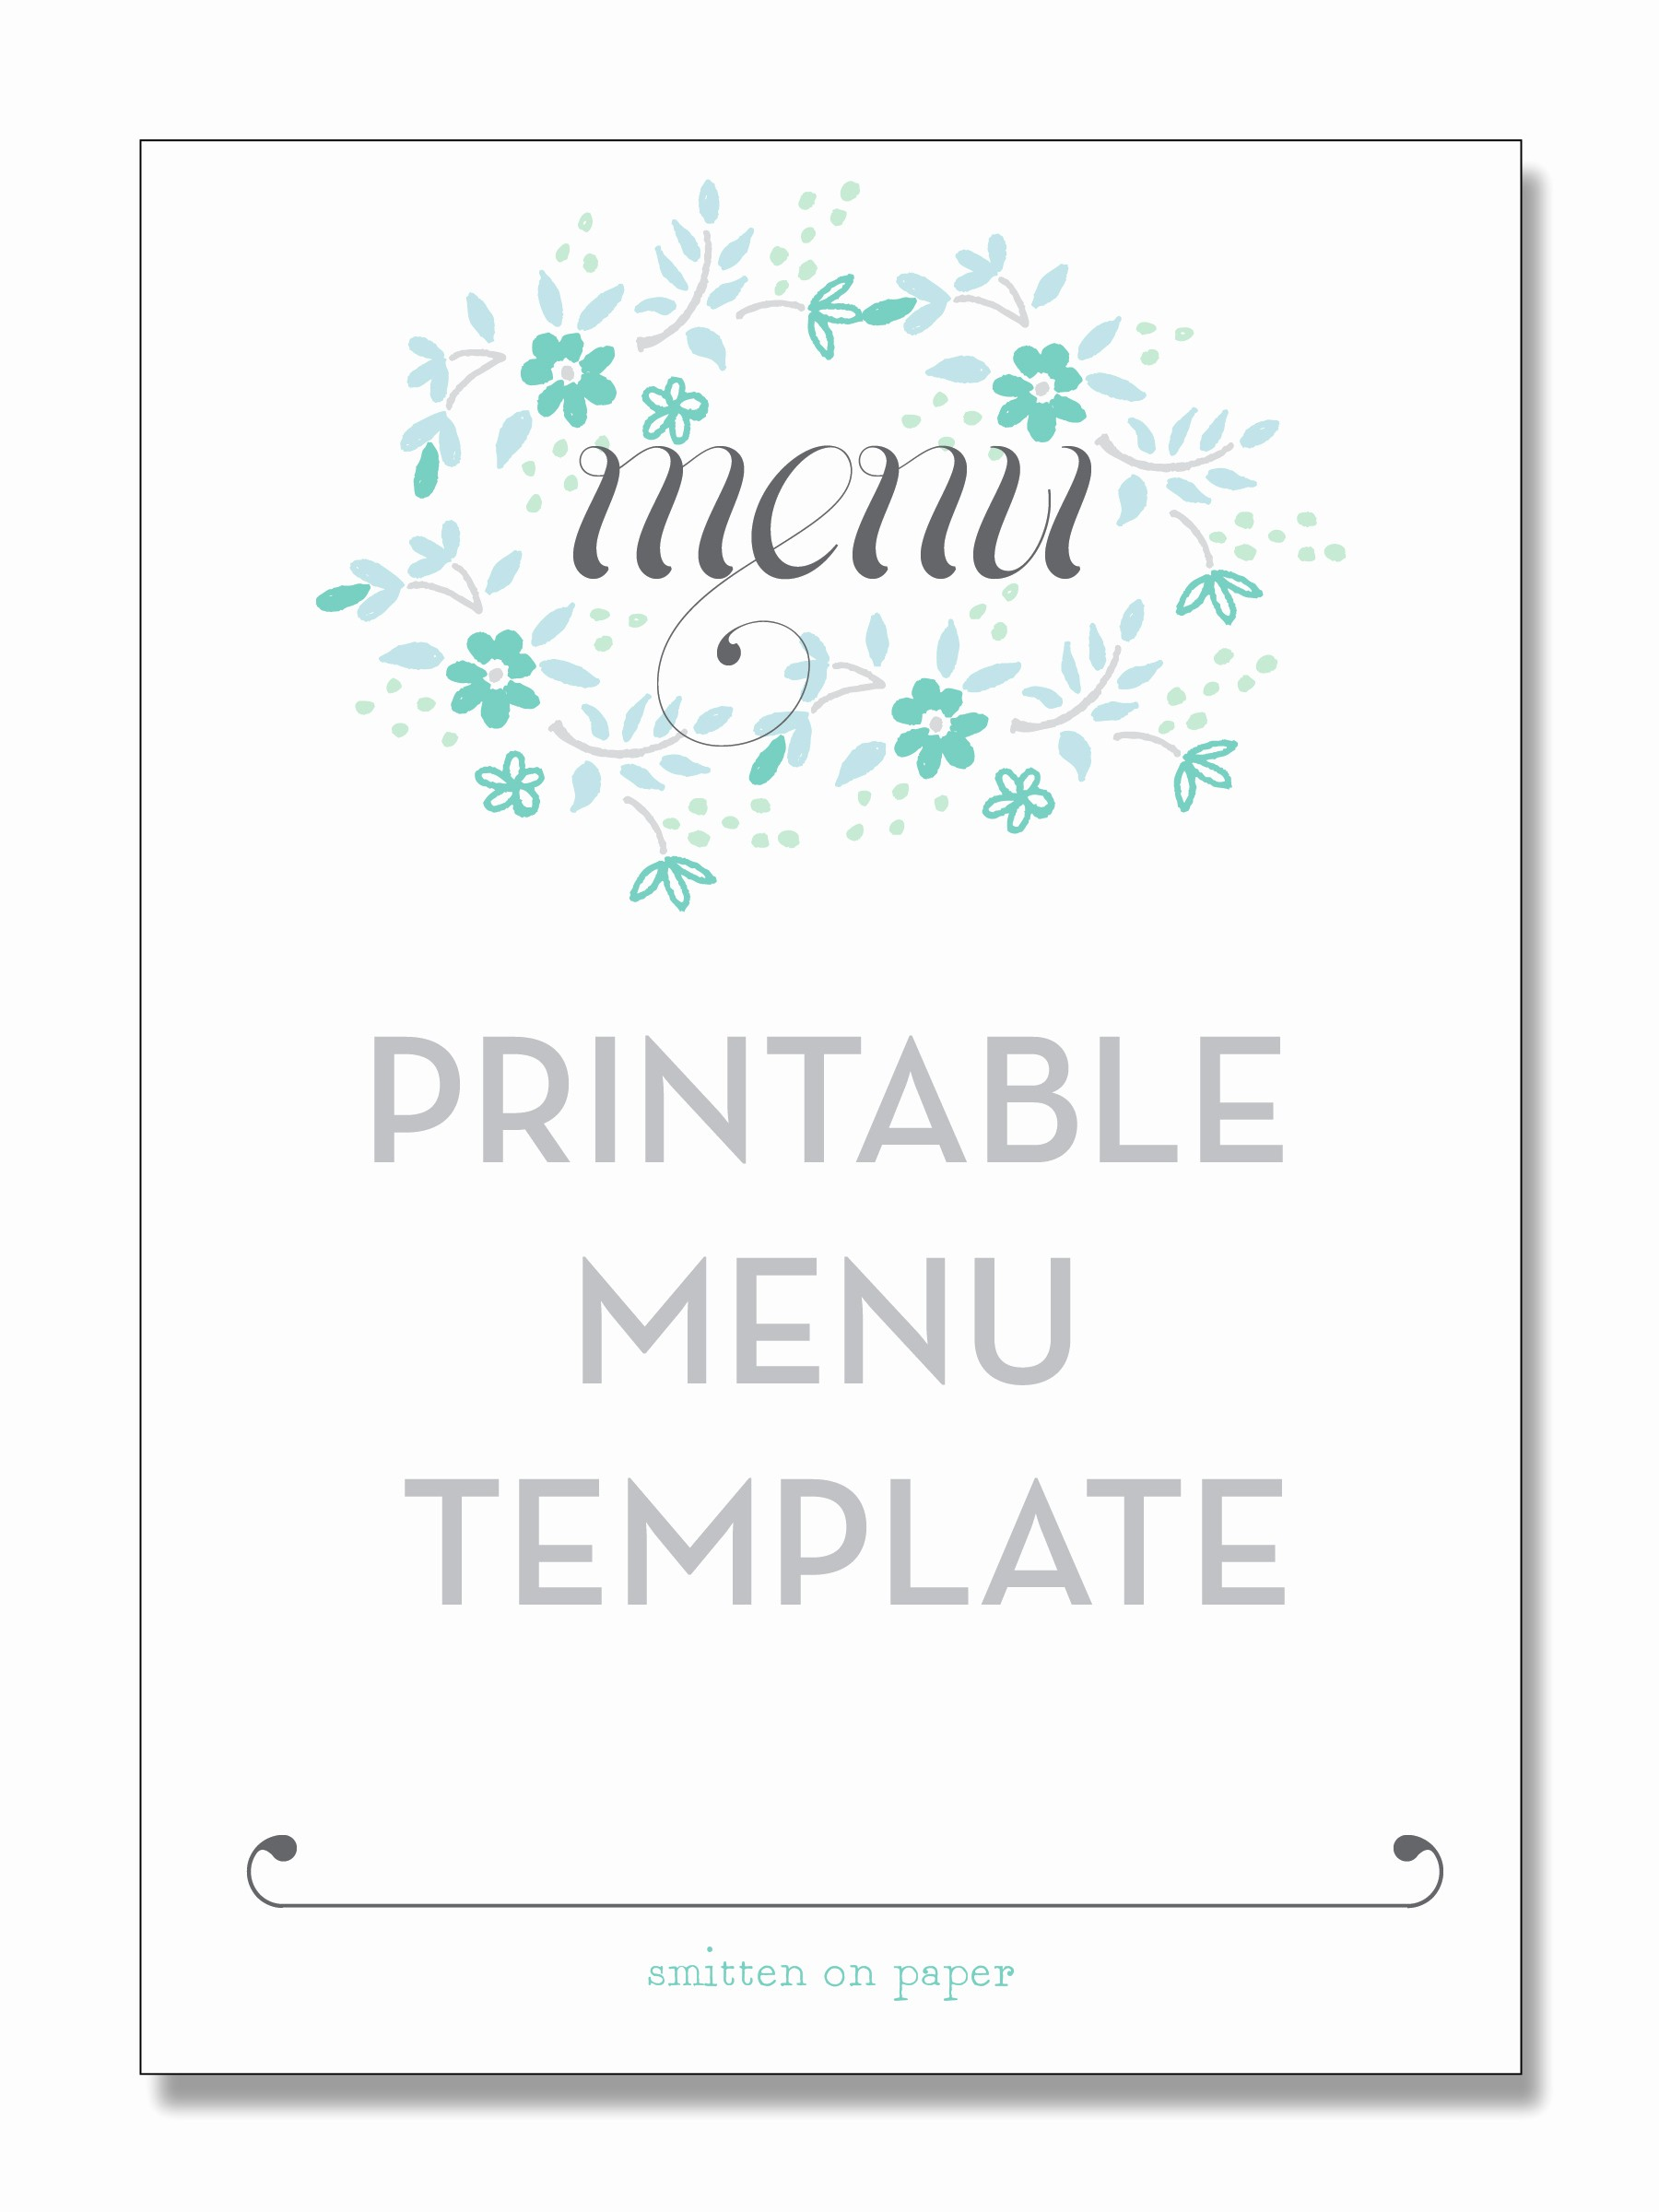 Free Downloadable Restaurant Menu Templates New 4 Best Of Free Printable Template Restaurant Menus